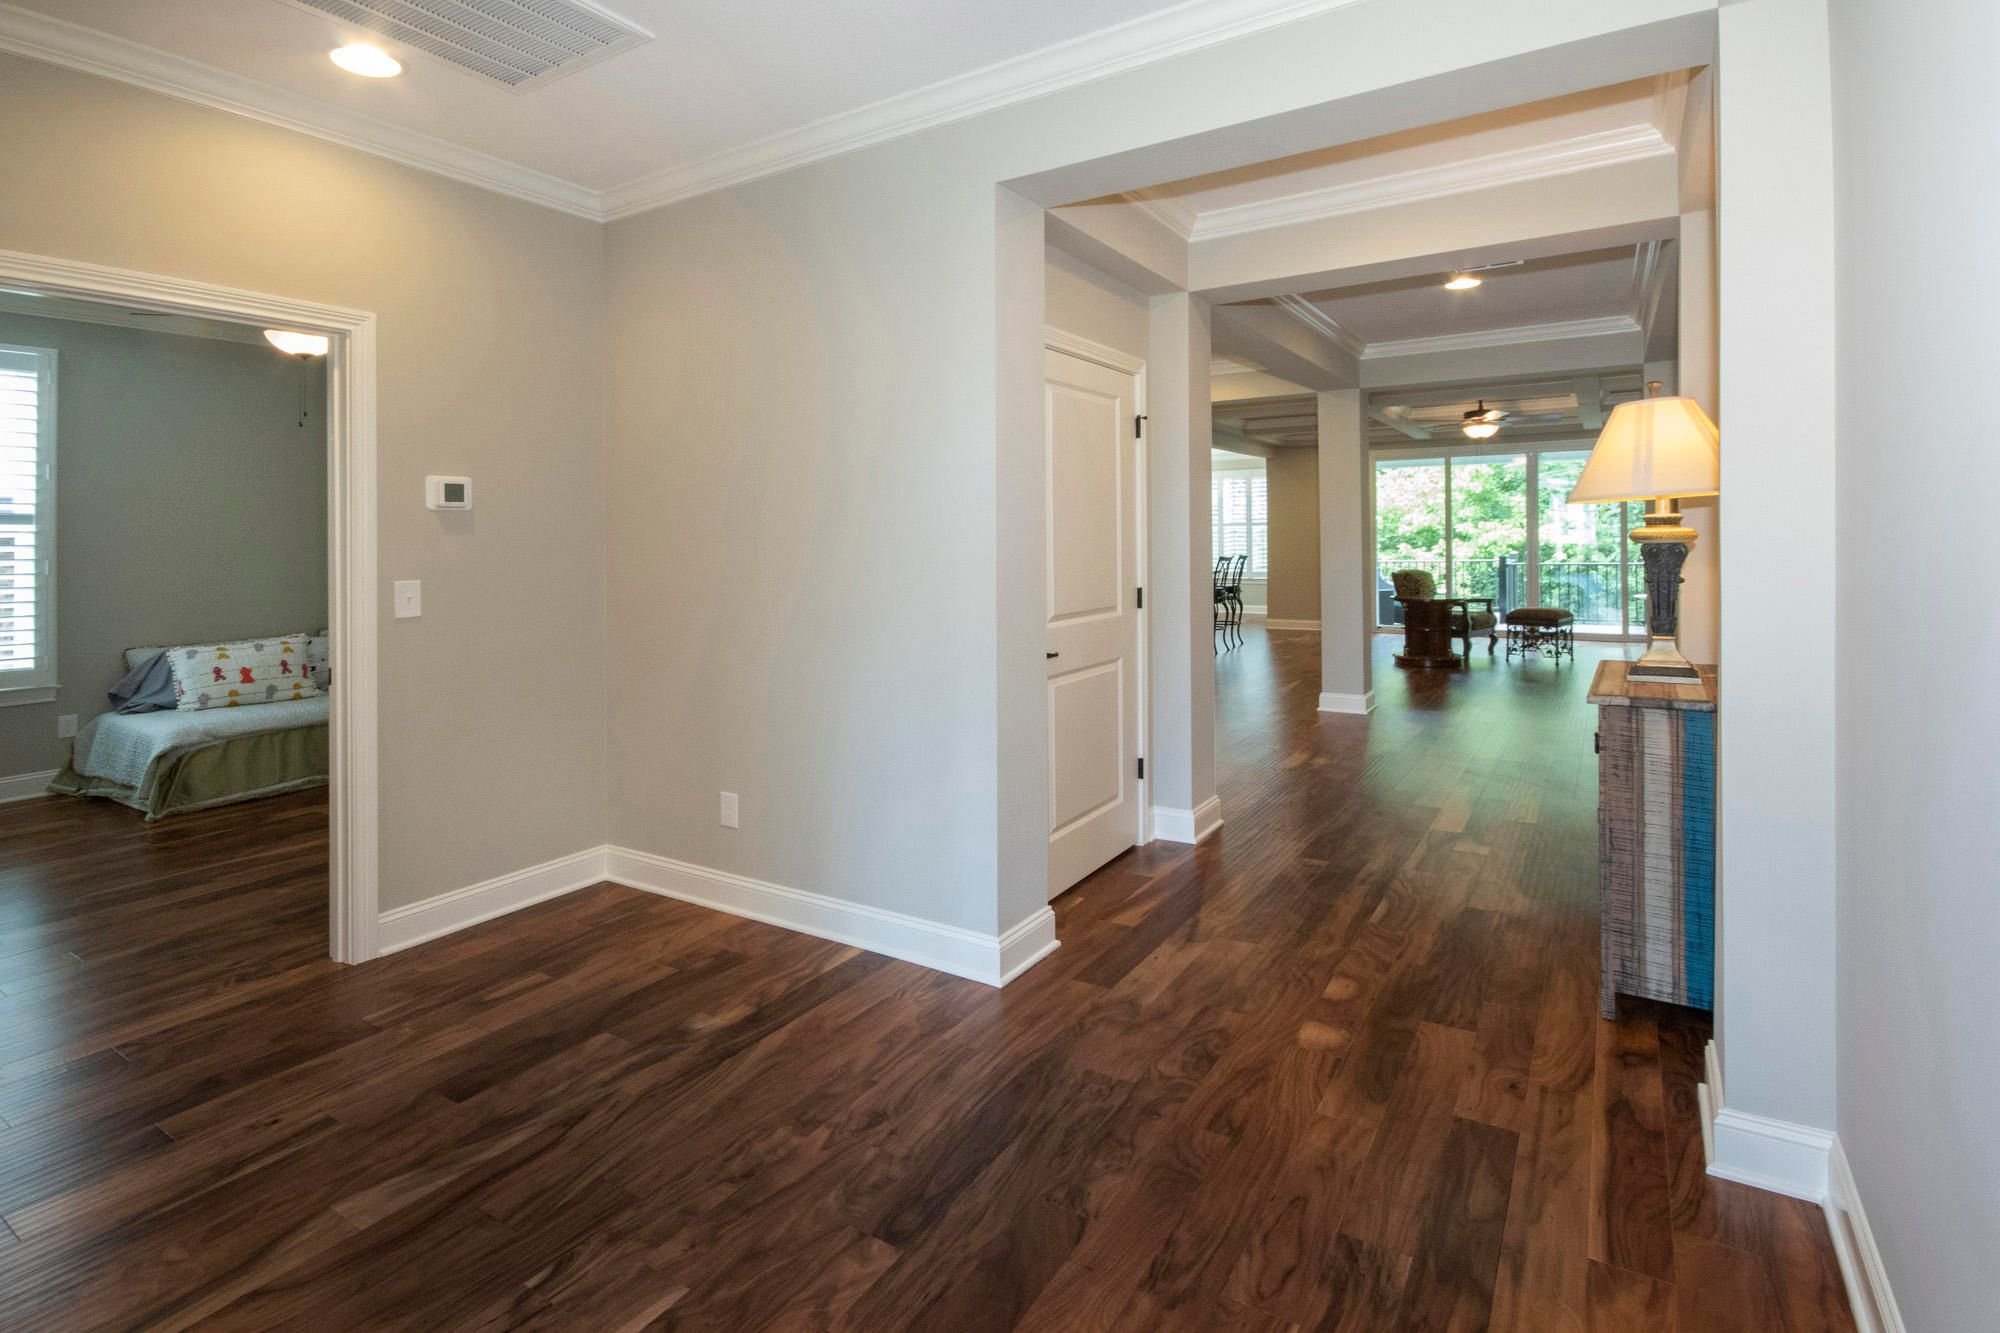 Gorgeous wood floors through main level